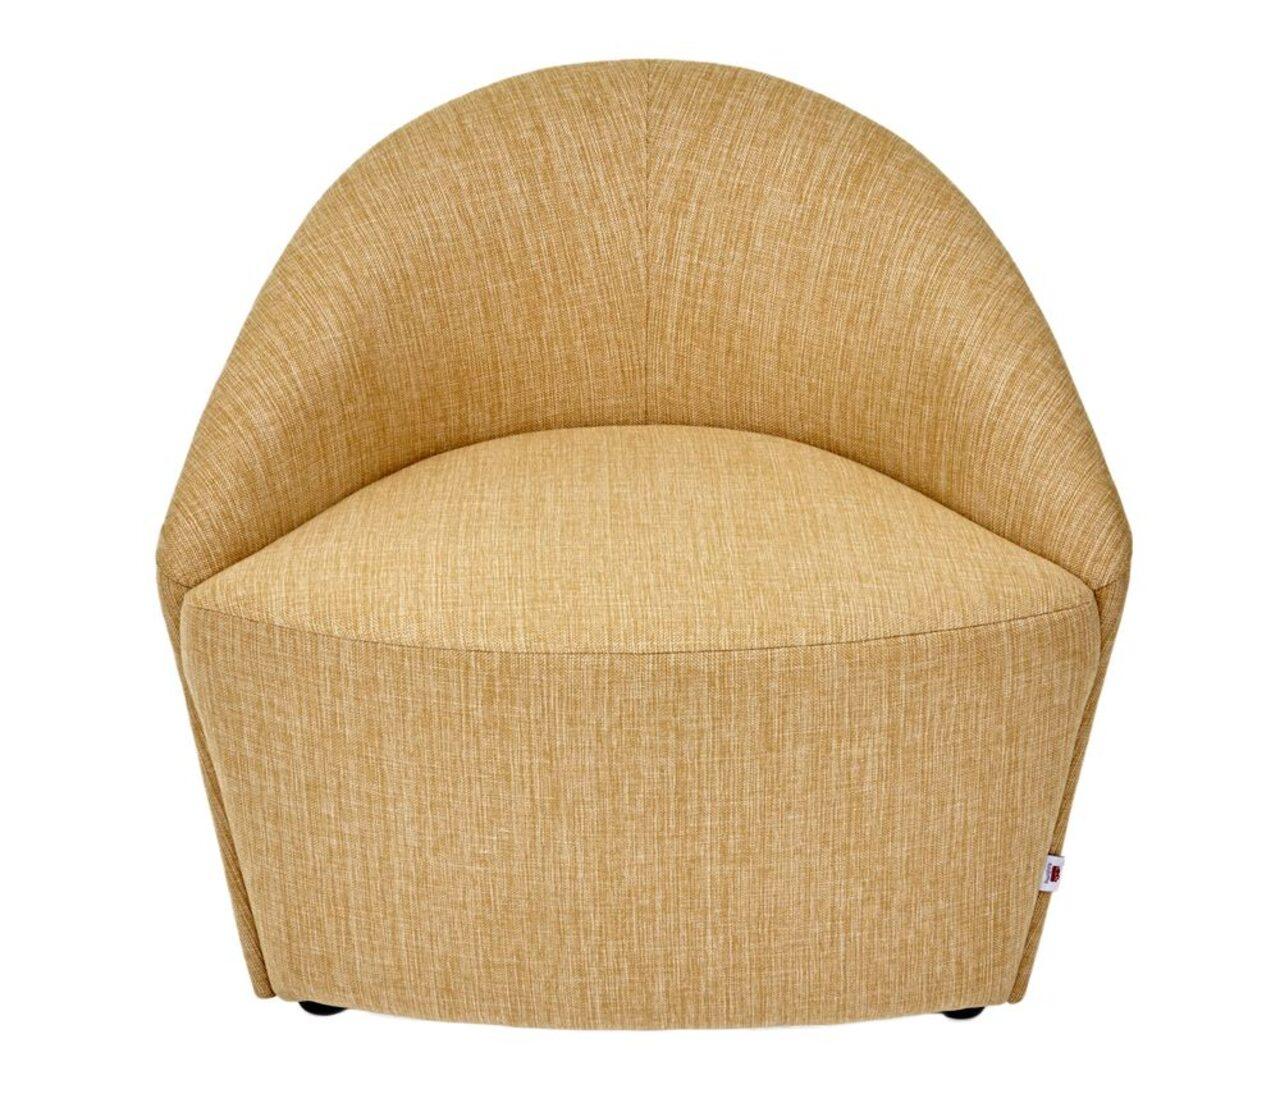 Кресло стационарное  3D 79x65x71 - фото 3